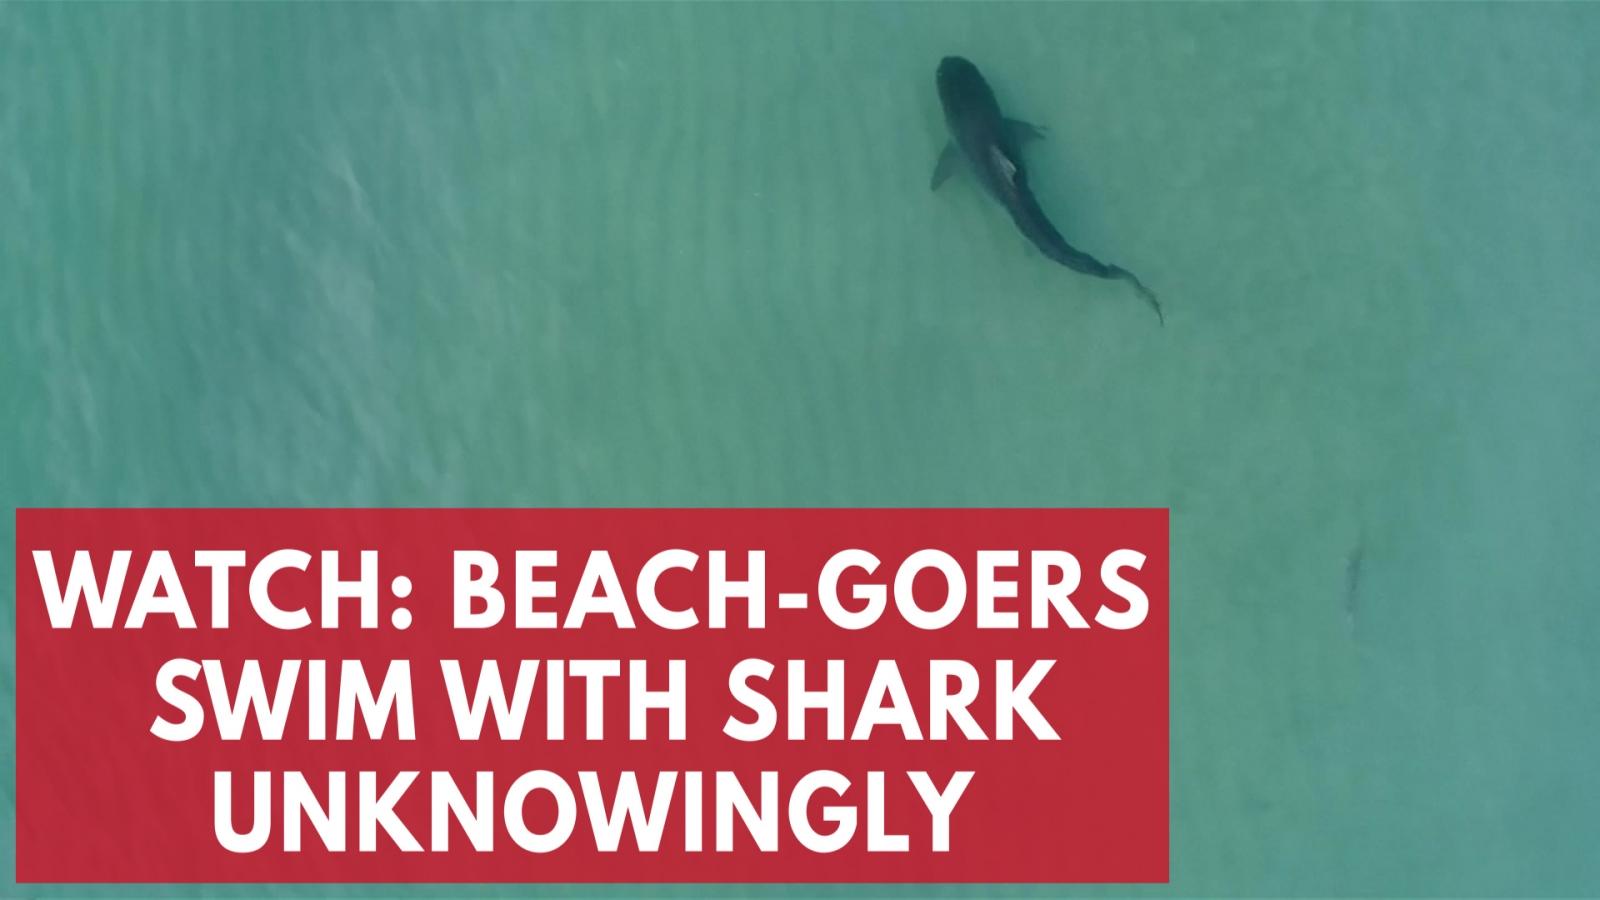 watch-beach-goers-swim-with-shark-unknowingly